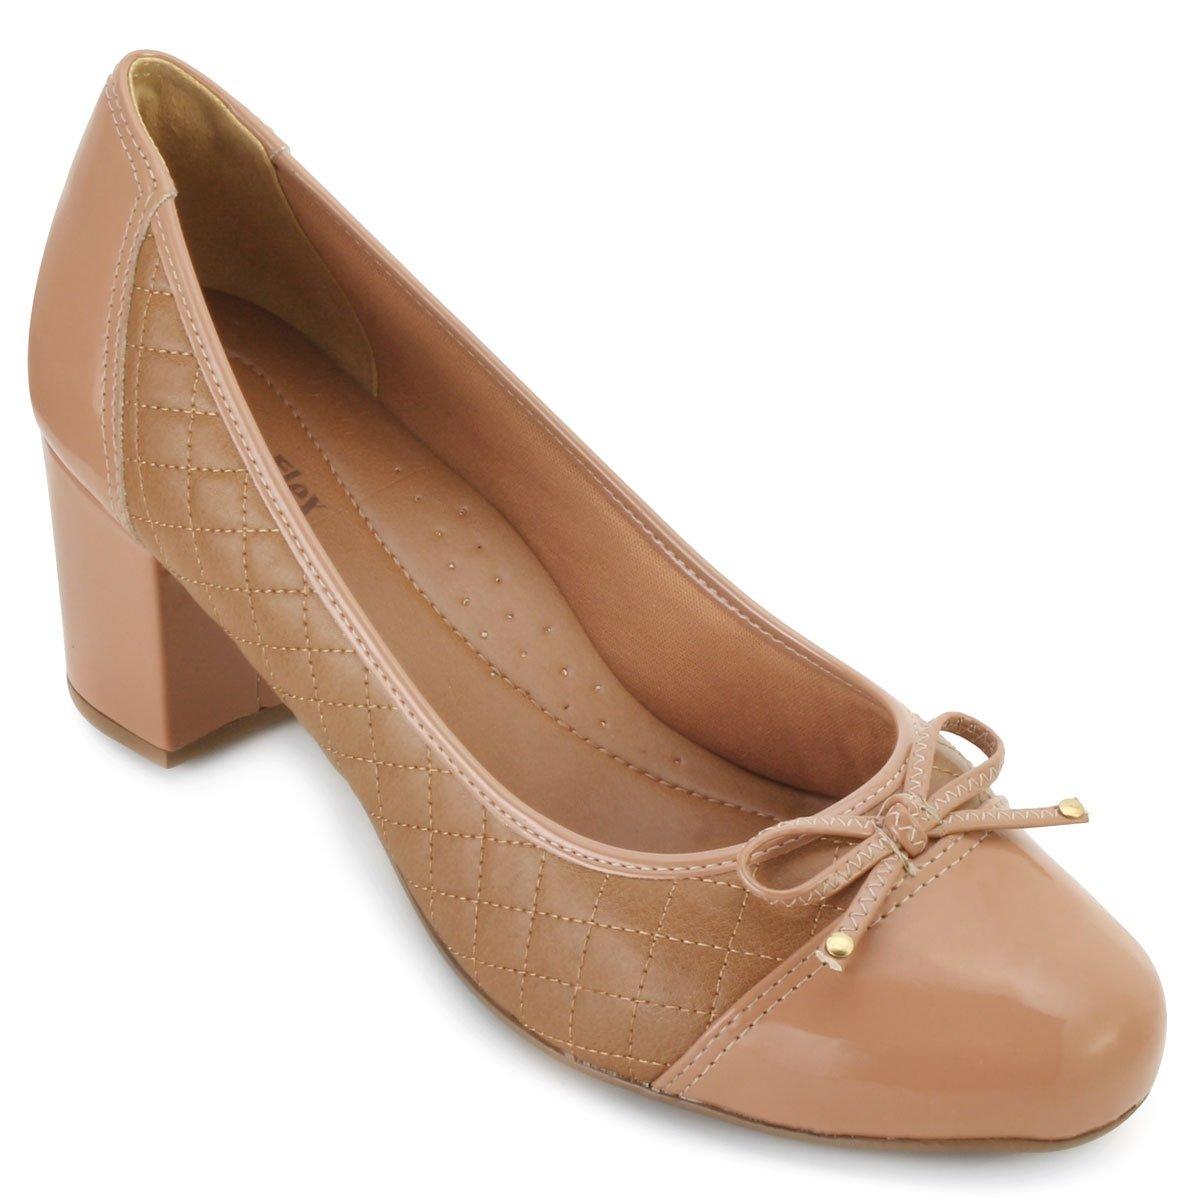 Sense Sapato Sapato Bege Sense qXxvRXH